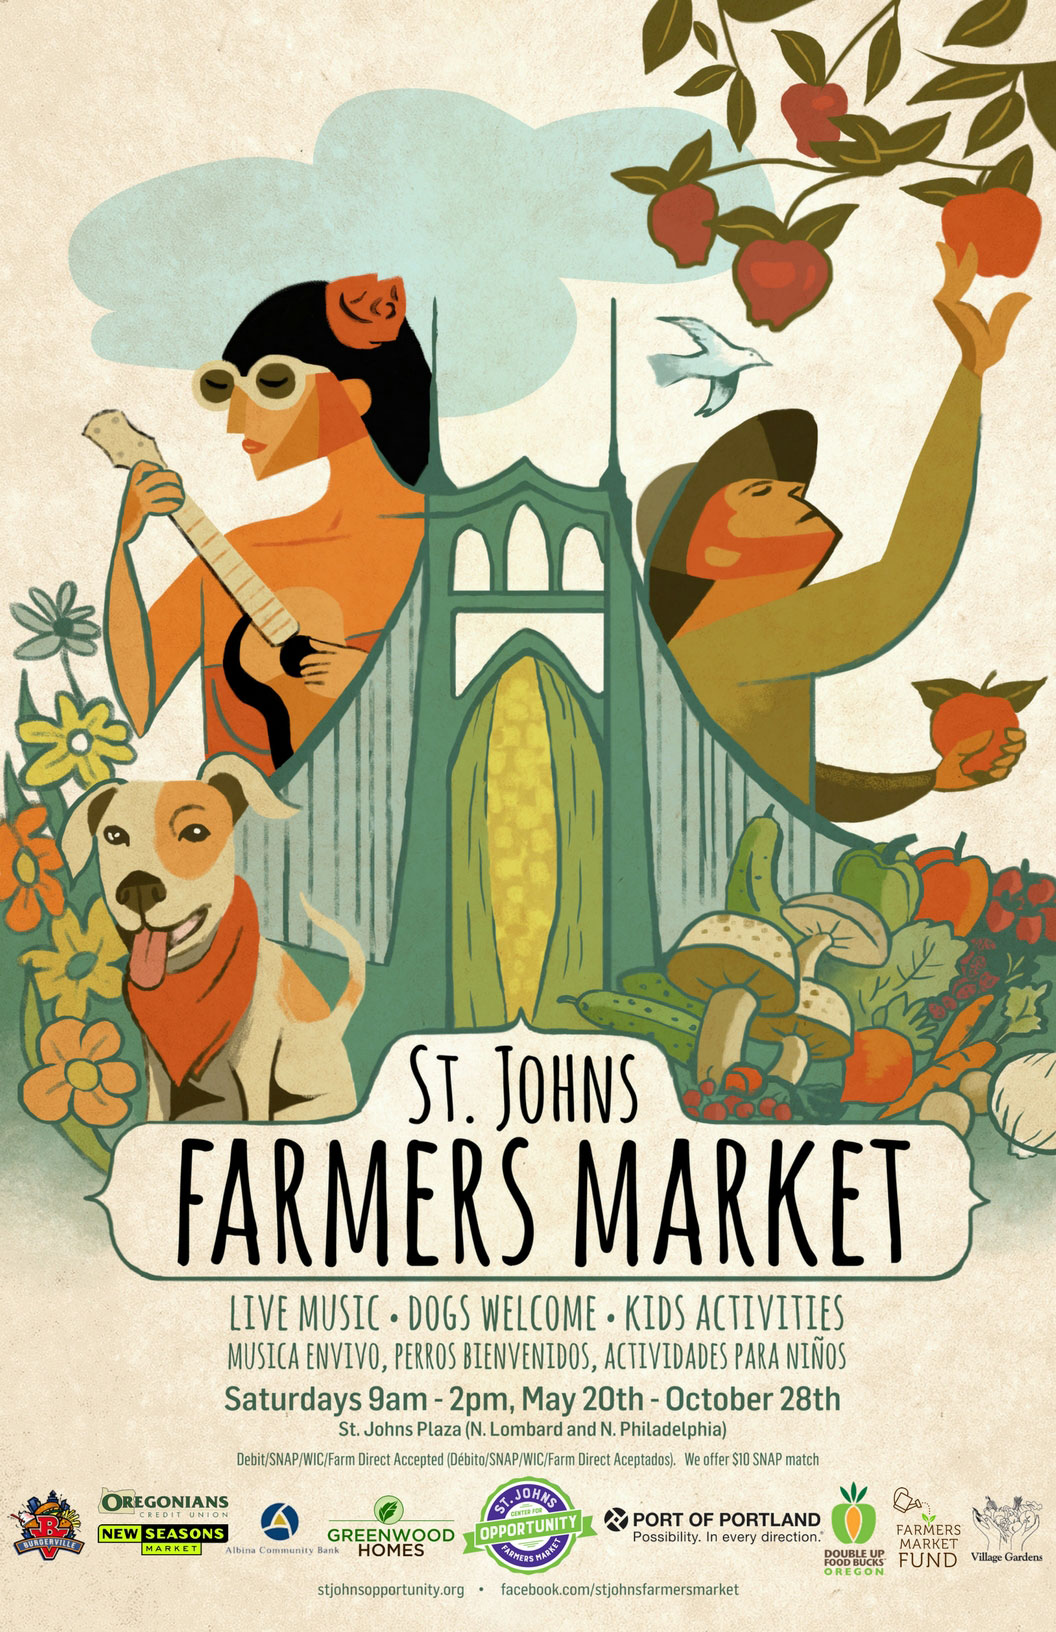 St. Johns Farmers Market poster